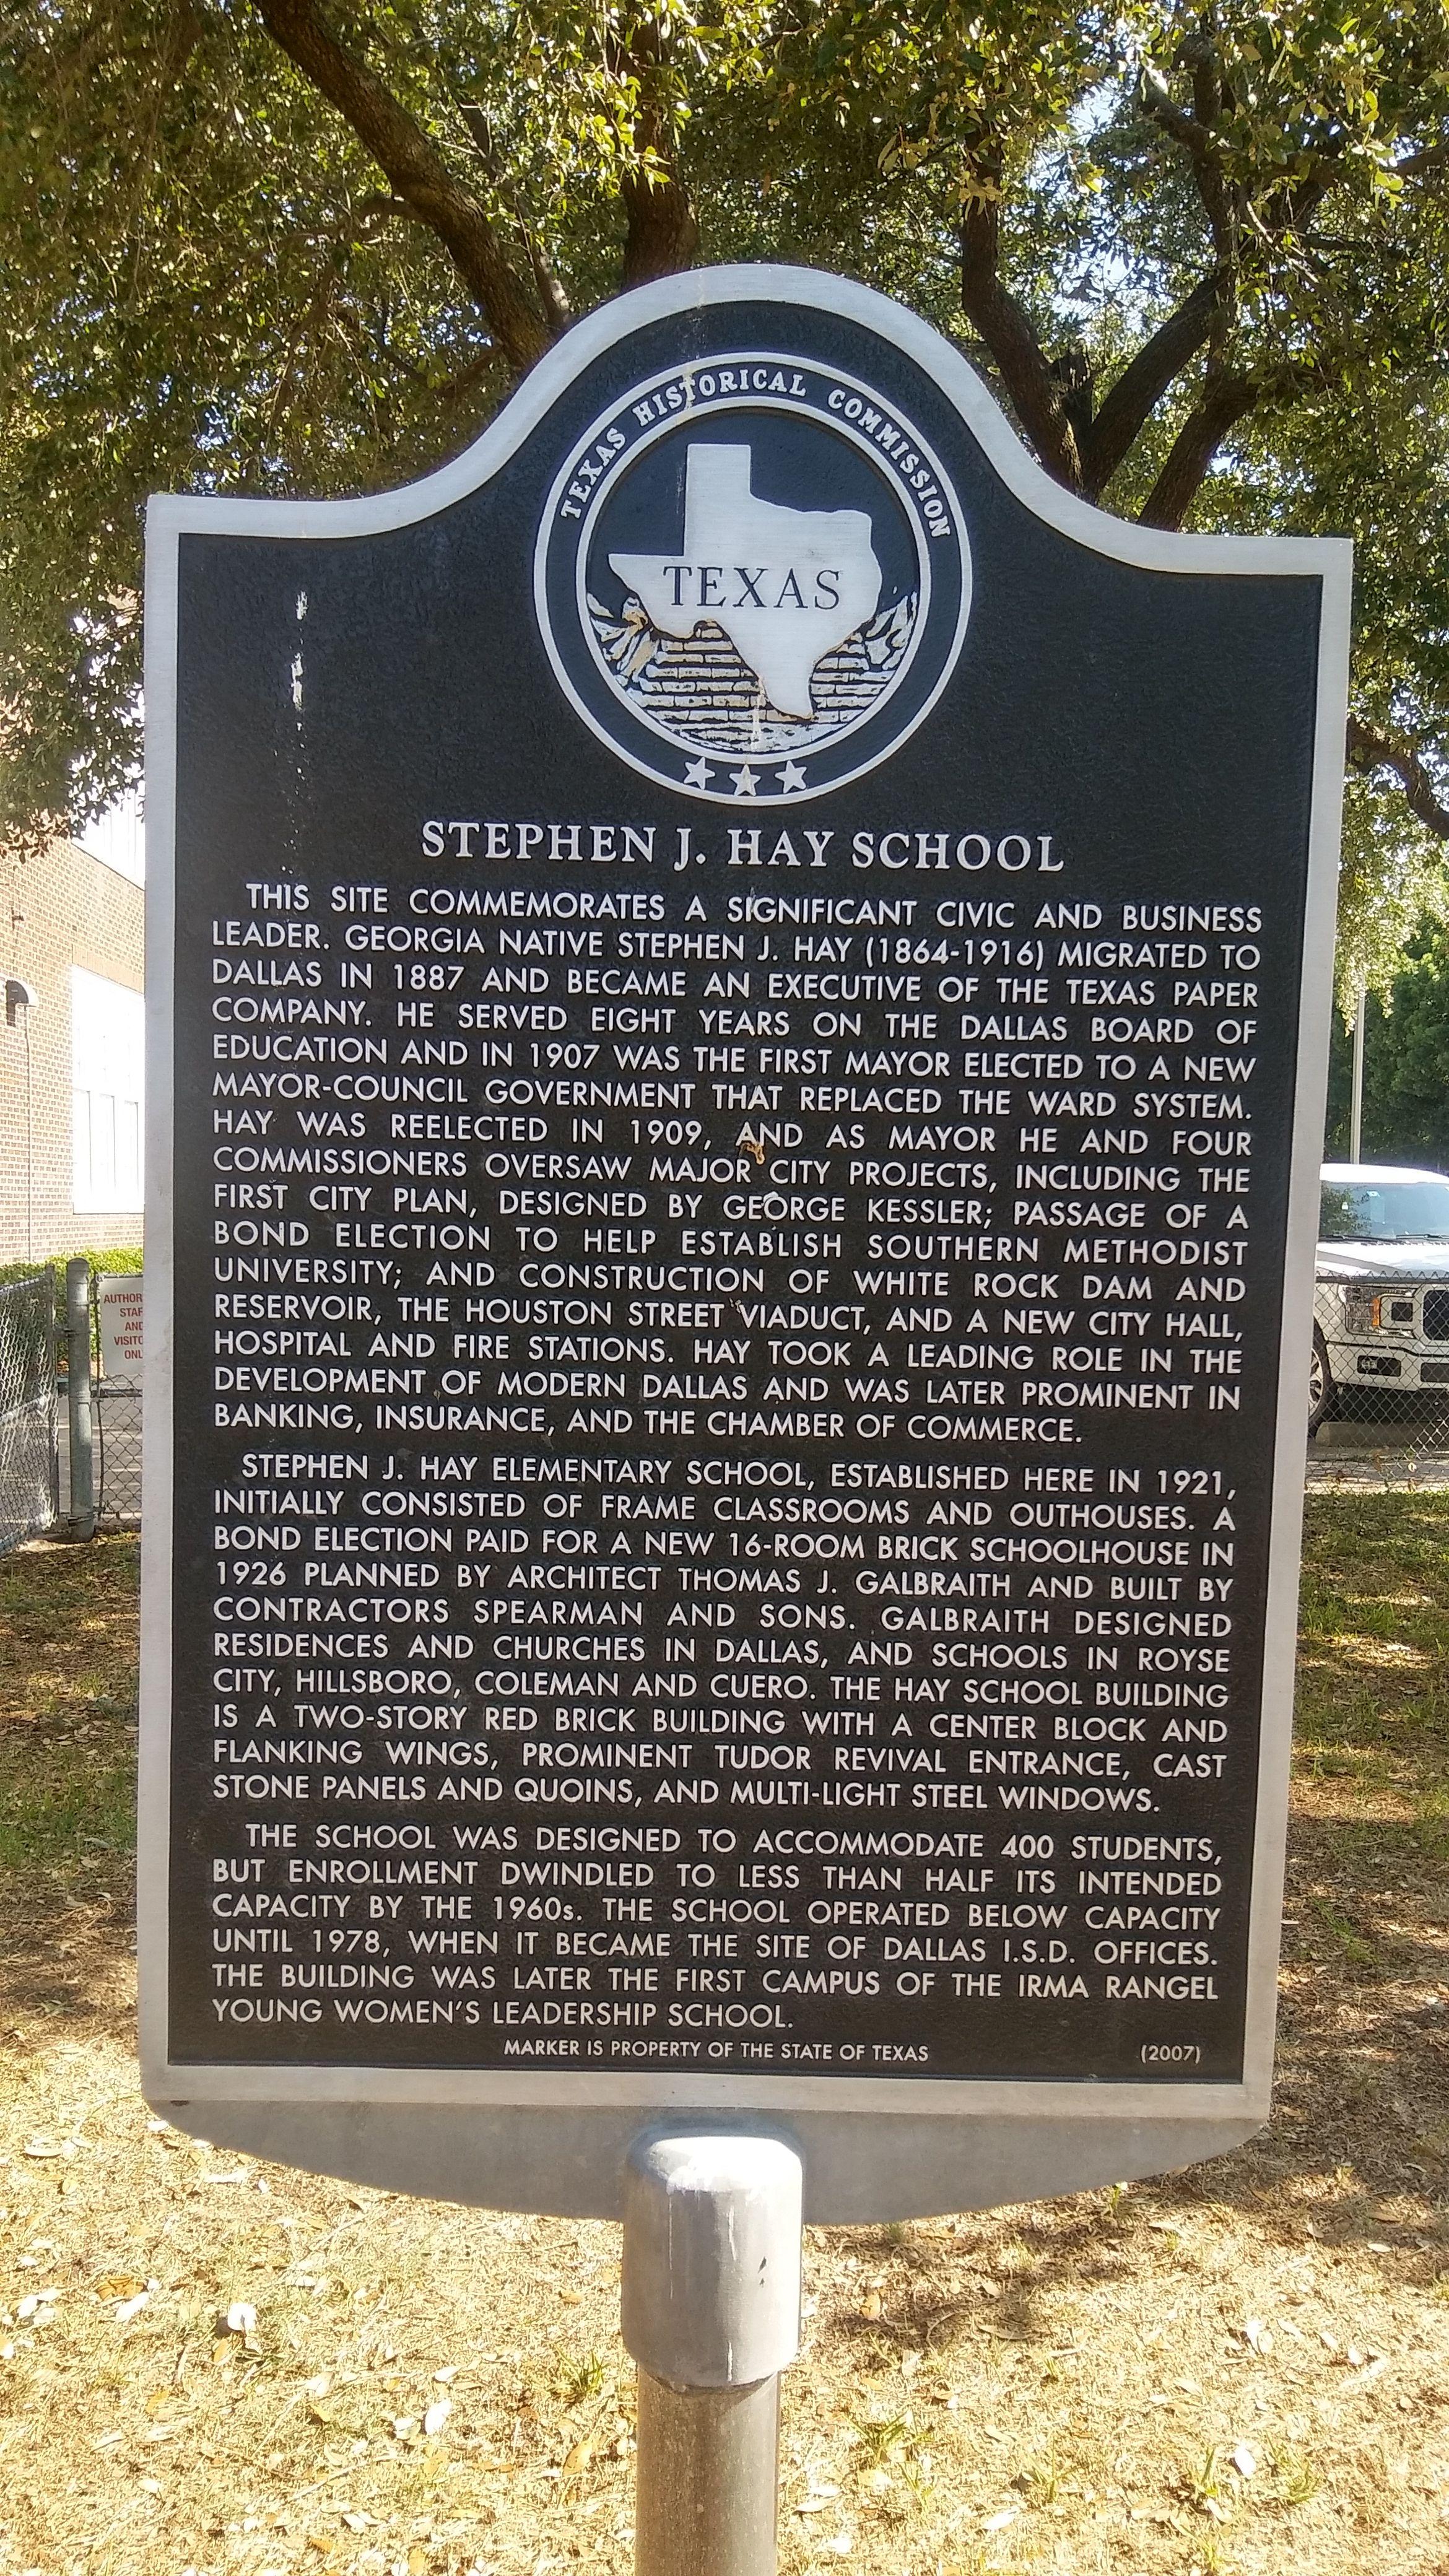 Stephen J Hay Elementary School Marker